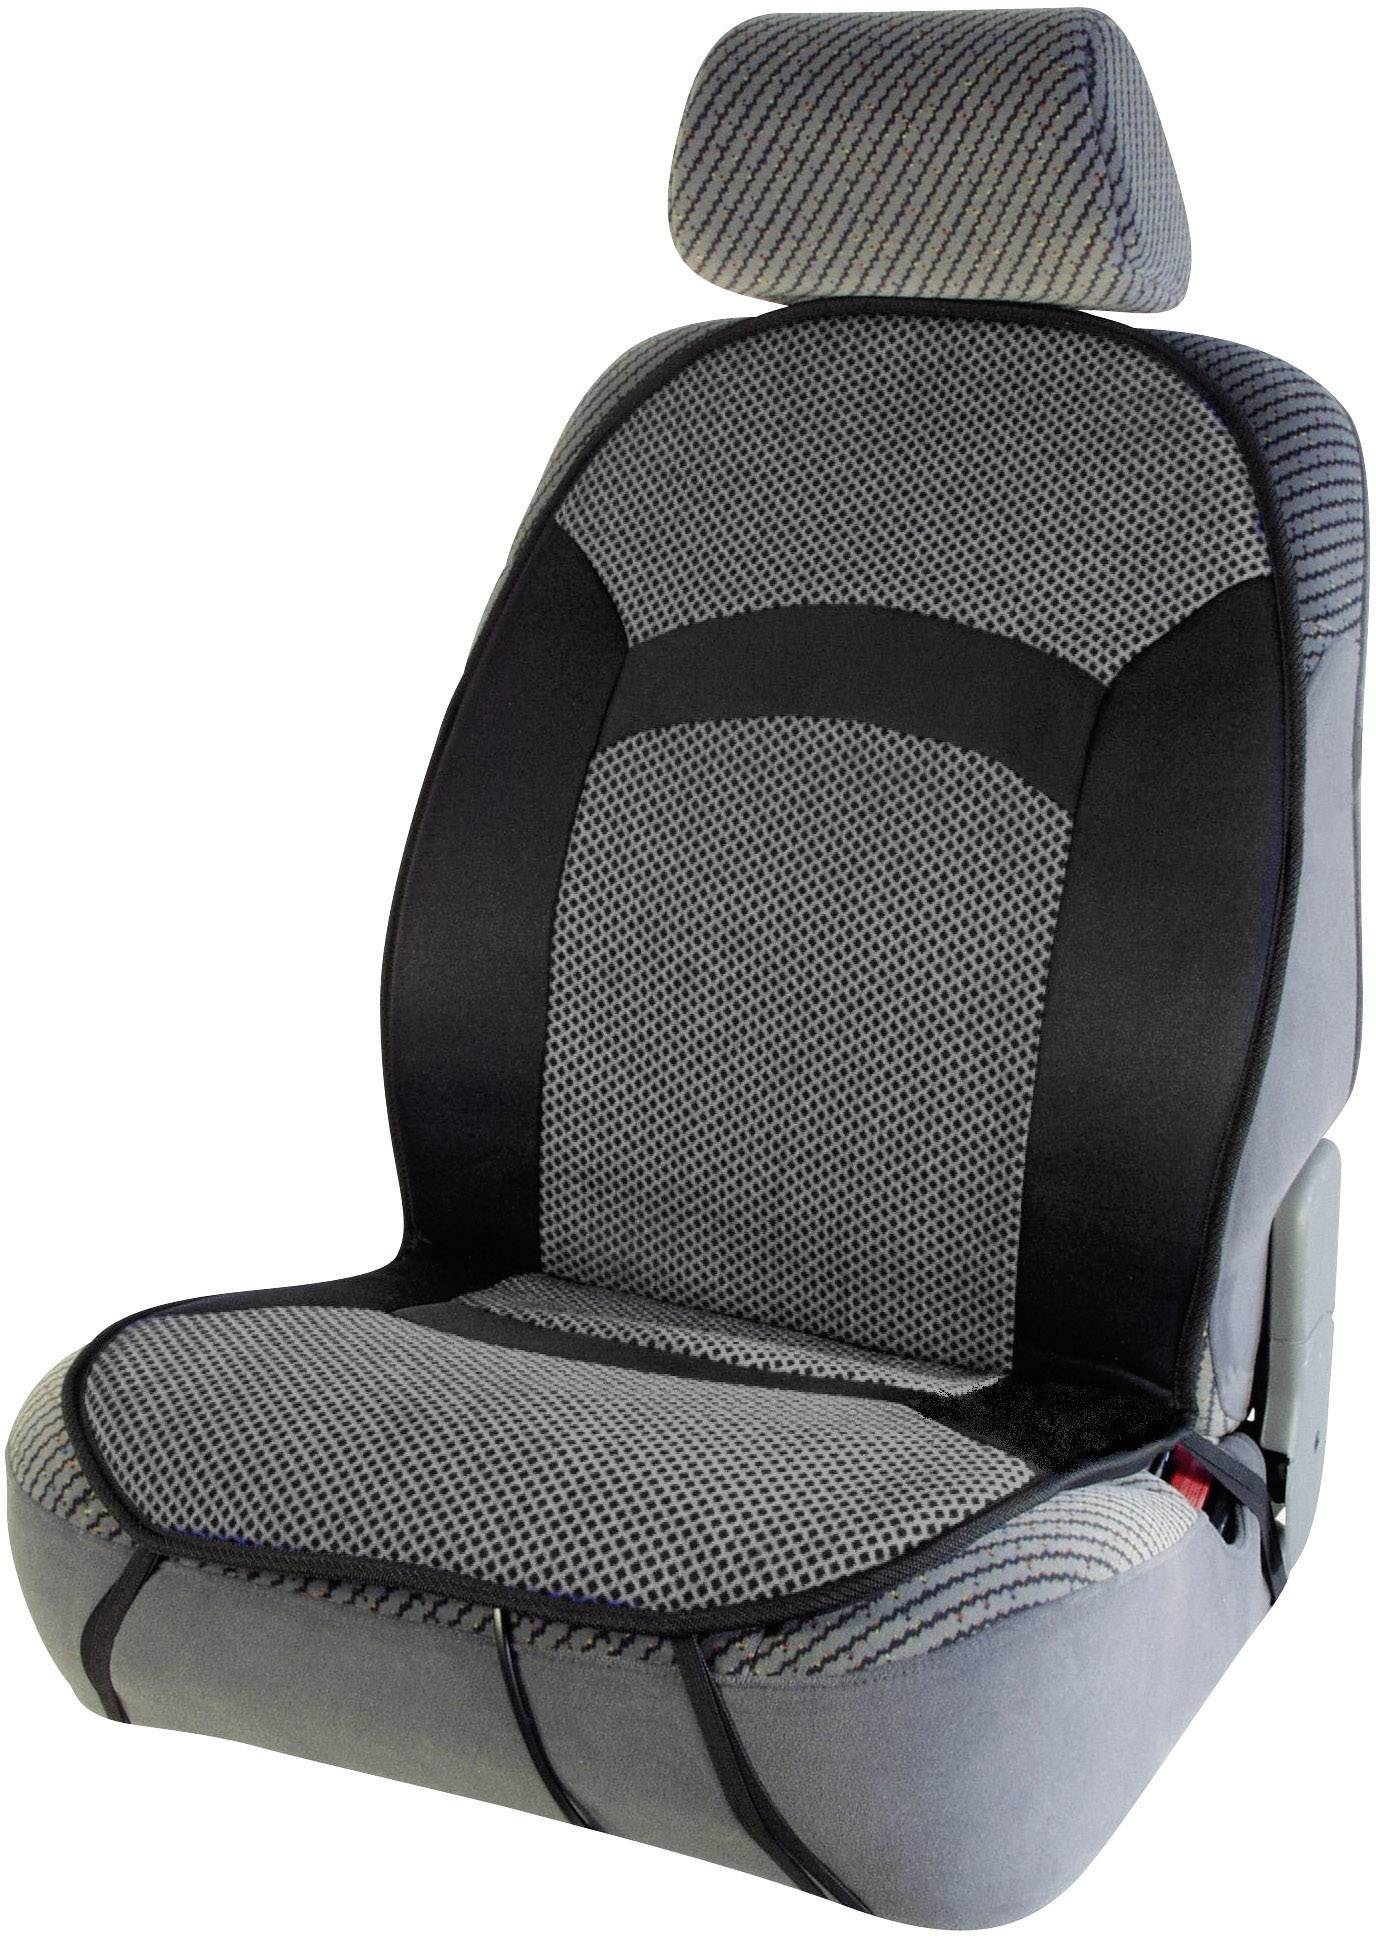 Komfortné vybavenie automobilu